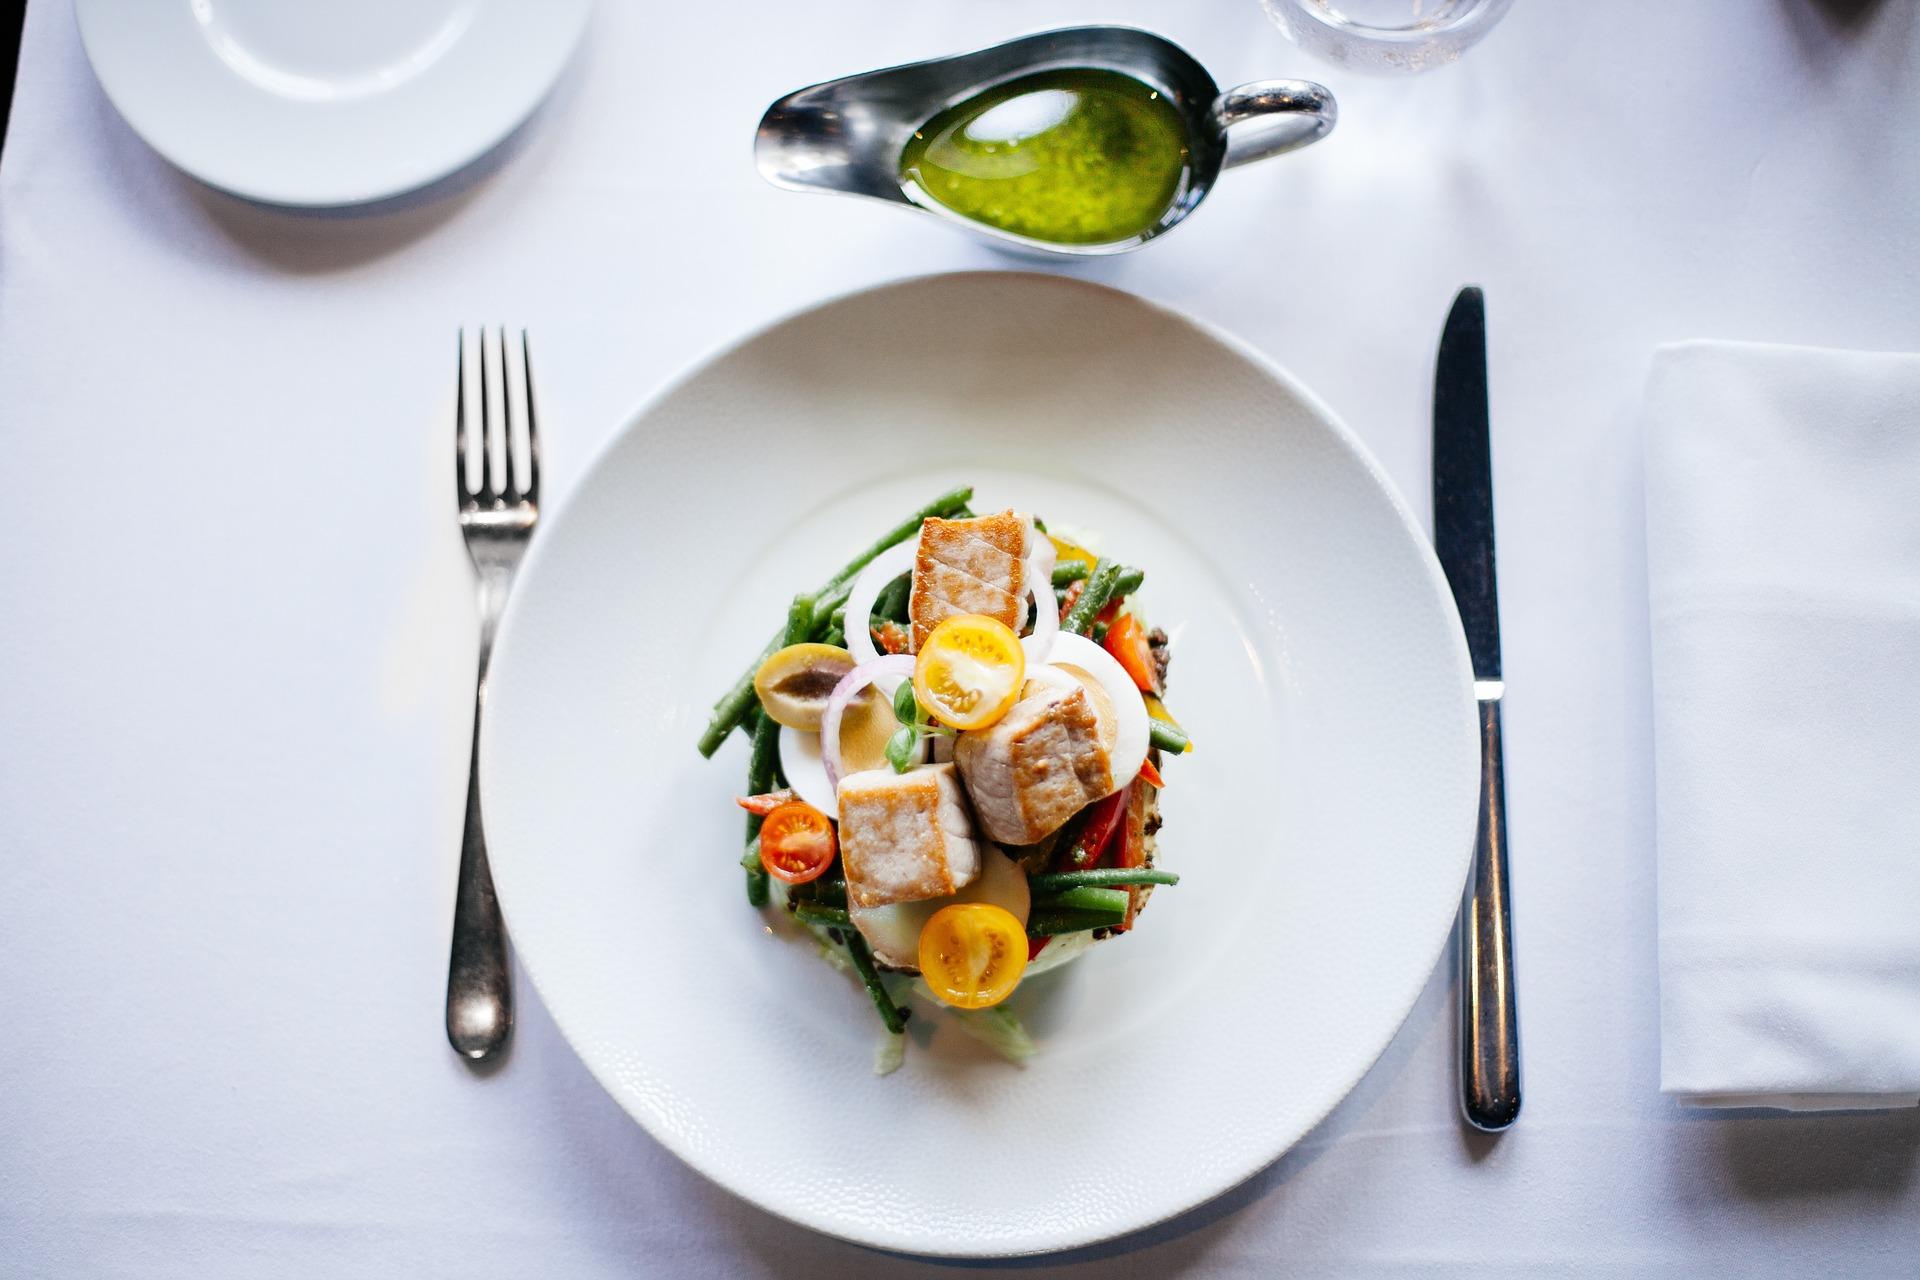 dieta proteica dimagrire